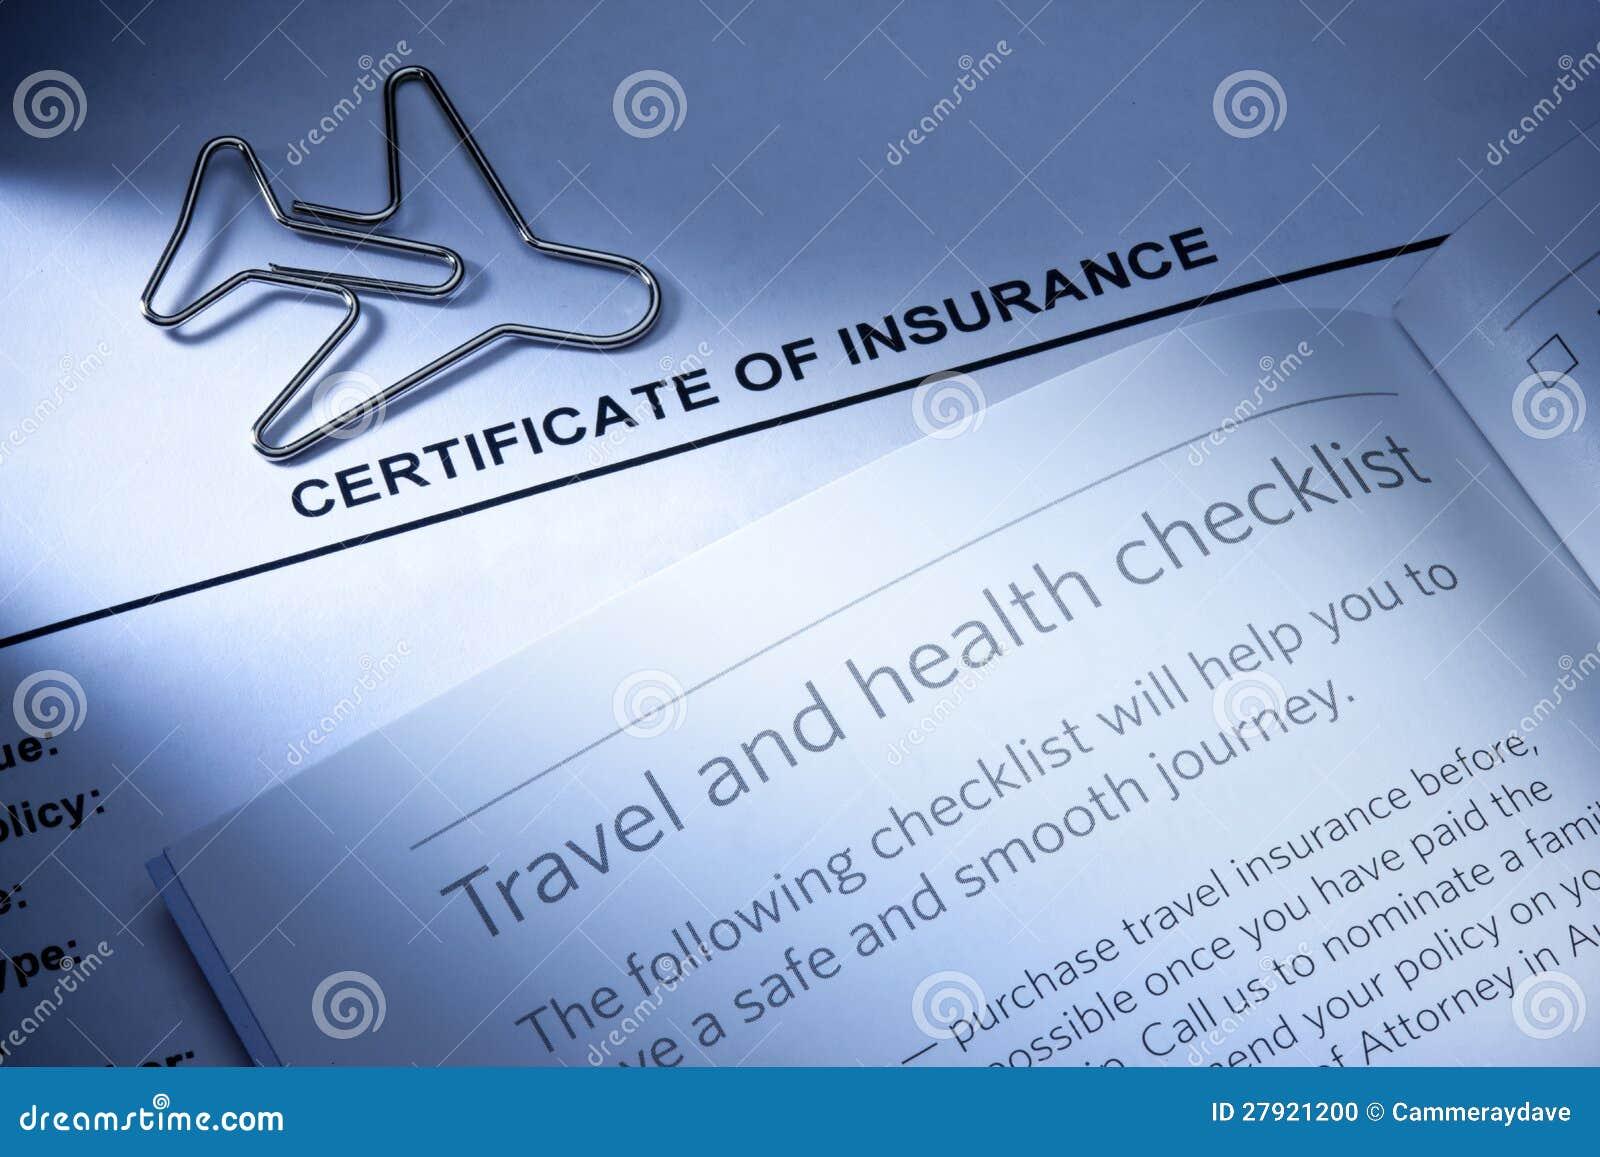 Vacation Insurance Positives And Negatives Hoppefinn61